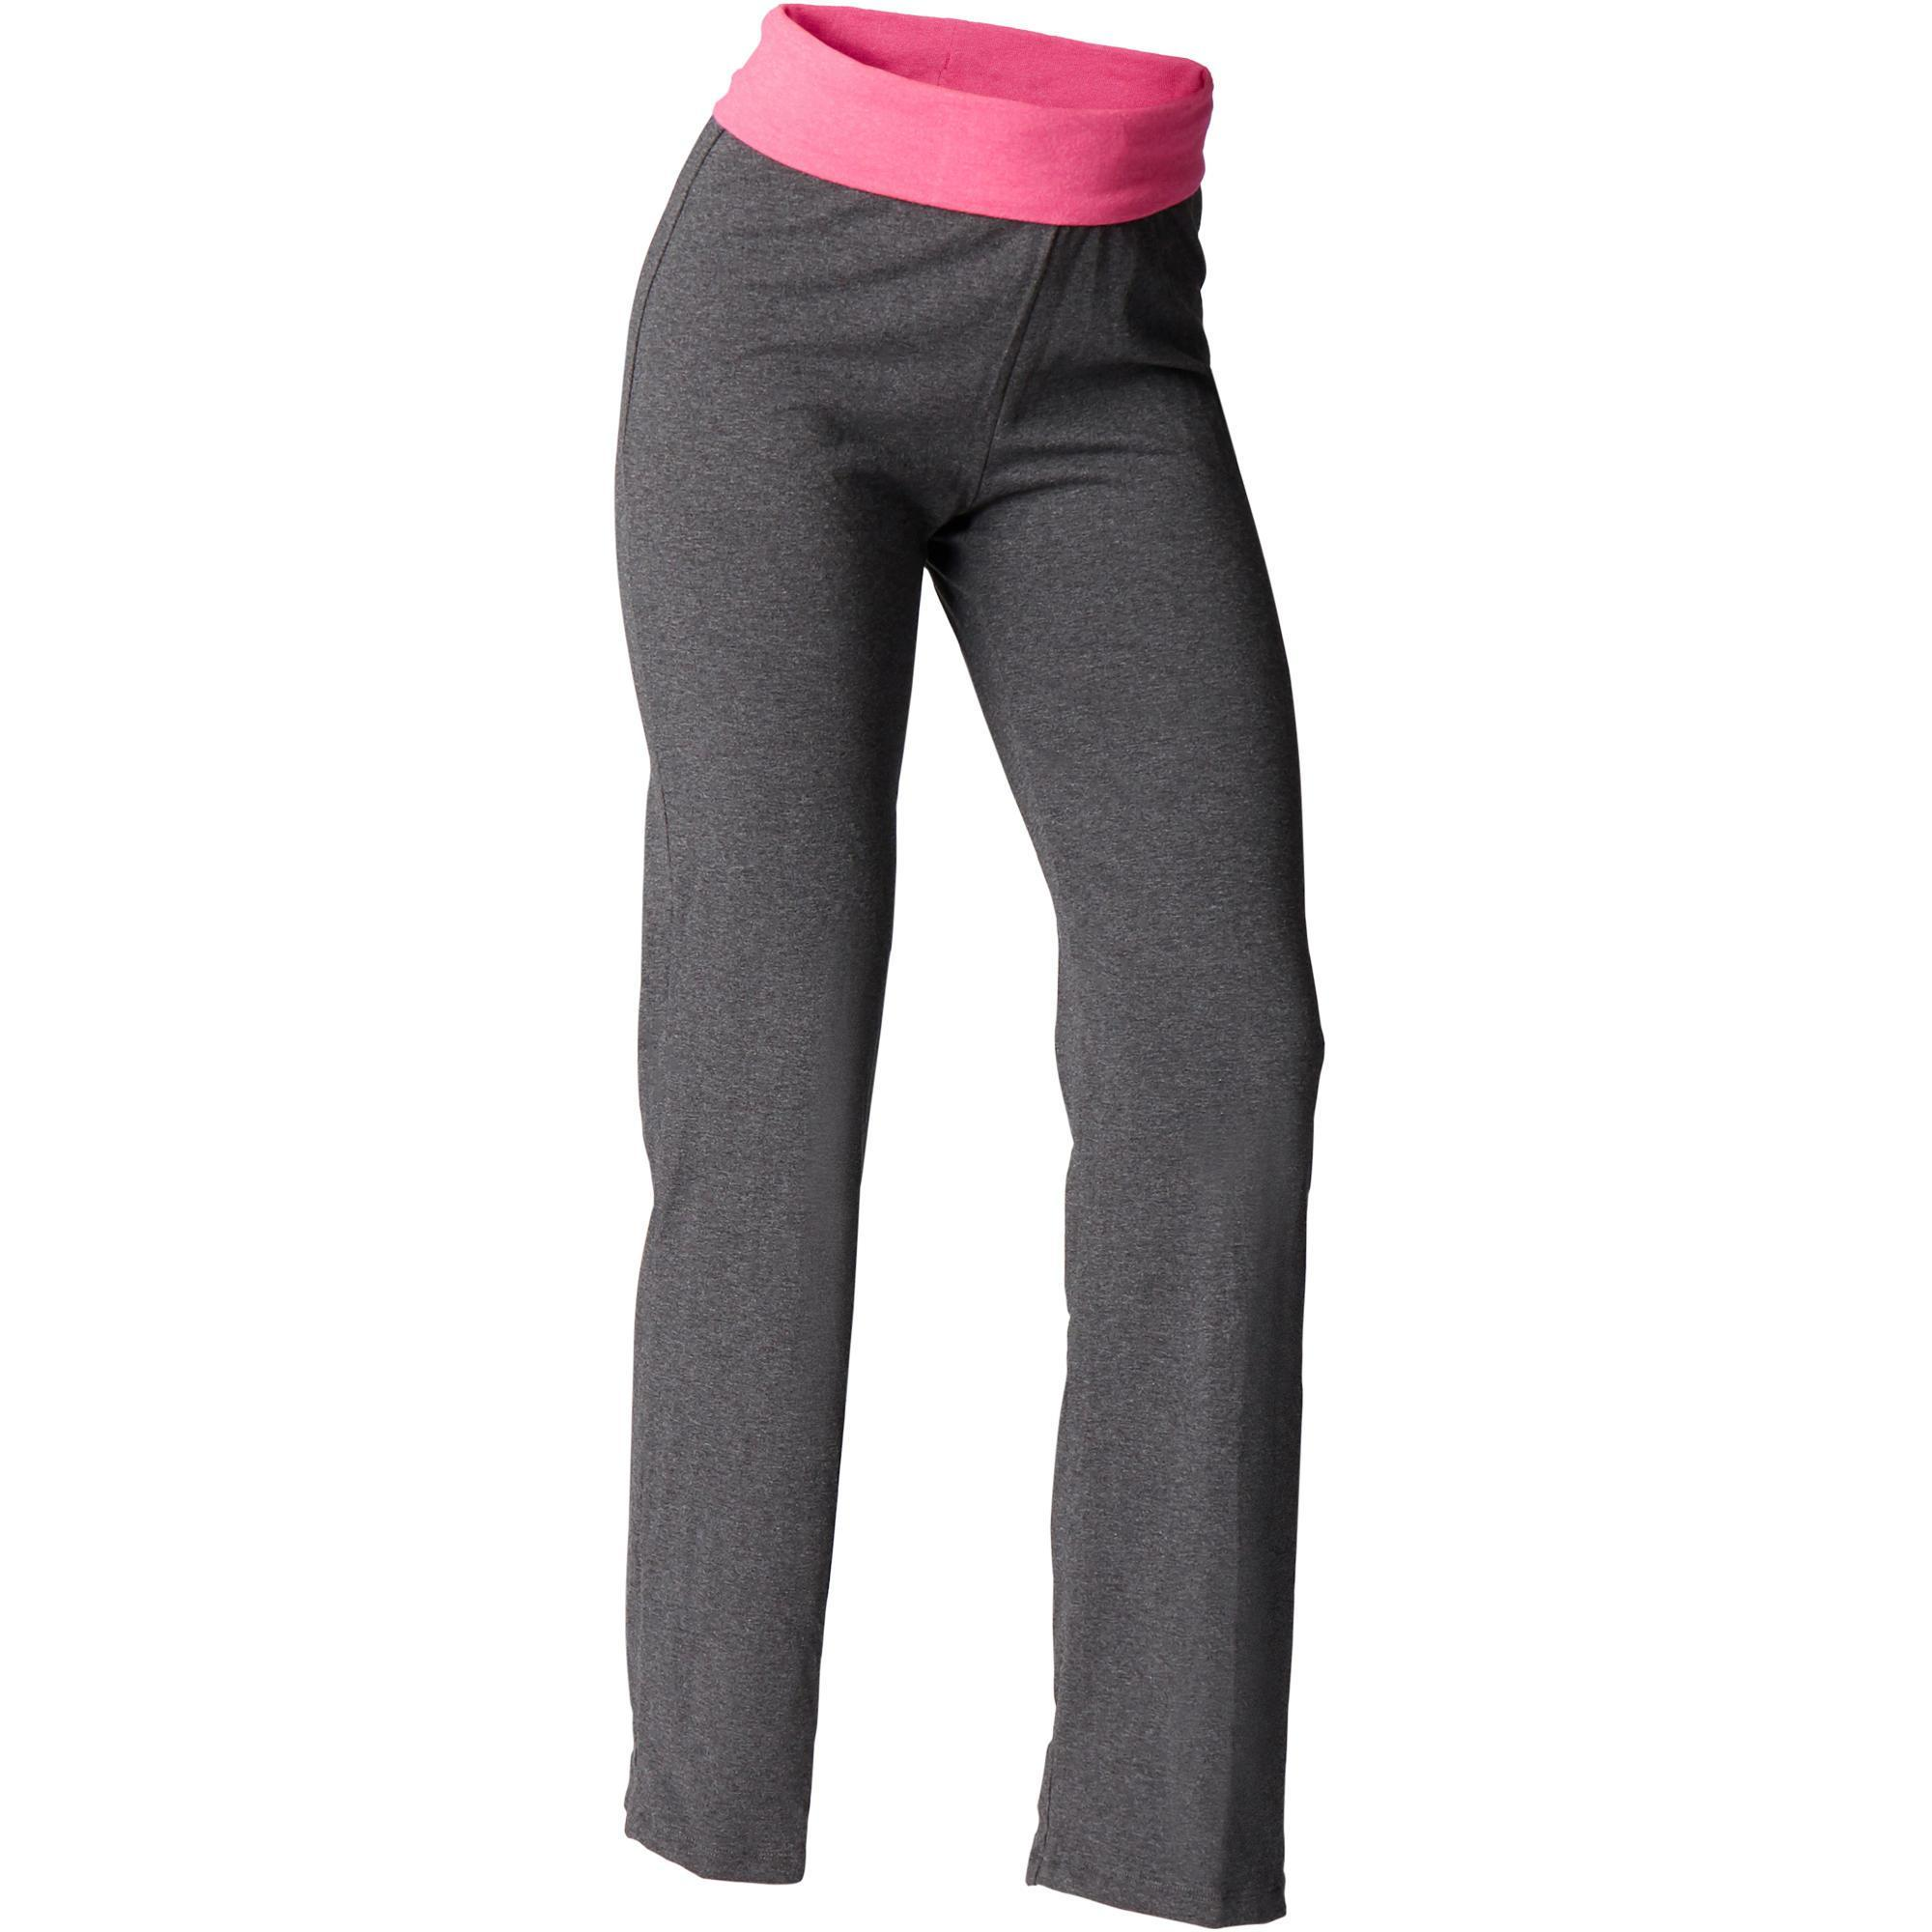 Yogahose sanftes Yoga aus Baumwolle aus biologischem Anbau Damen grau/rosa | Sportbekleidung > Sporthosen > Yogahosen | Grau - Rosa | Baumwolle | Domyos